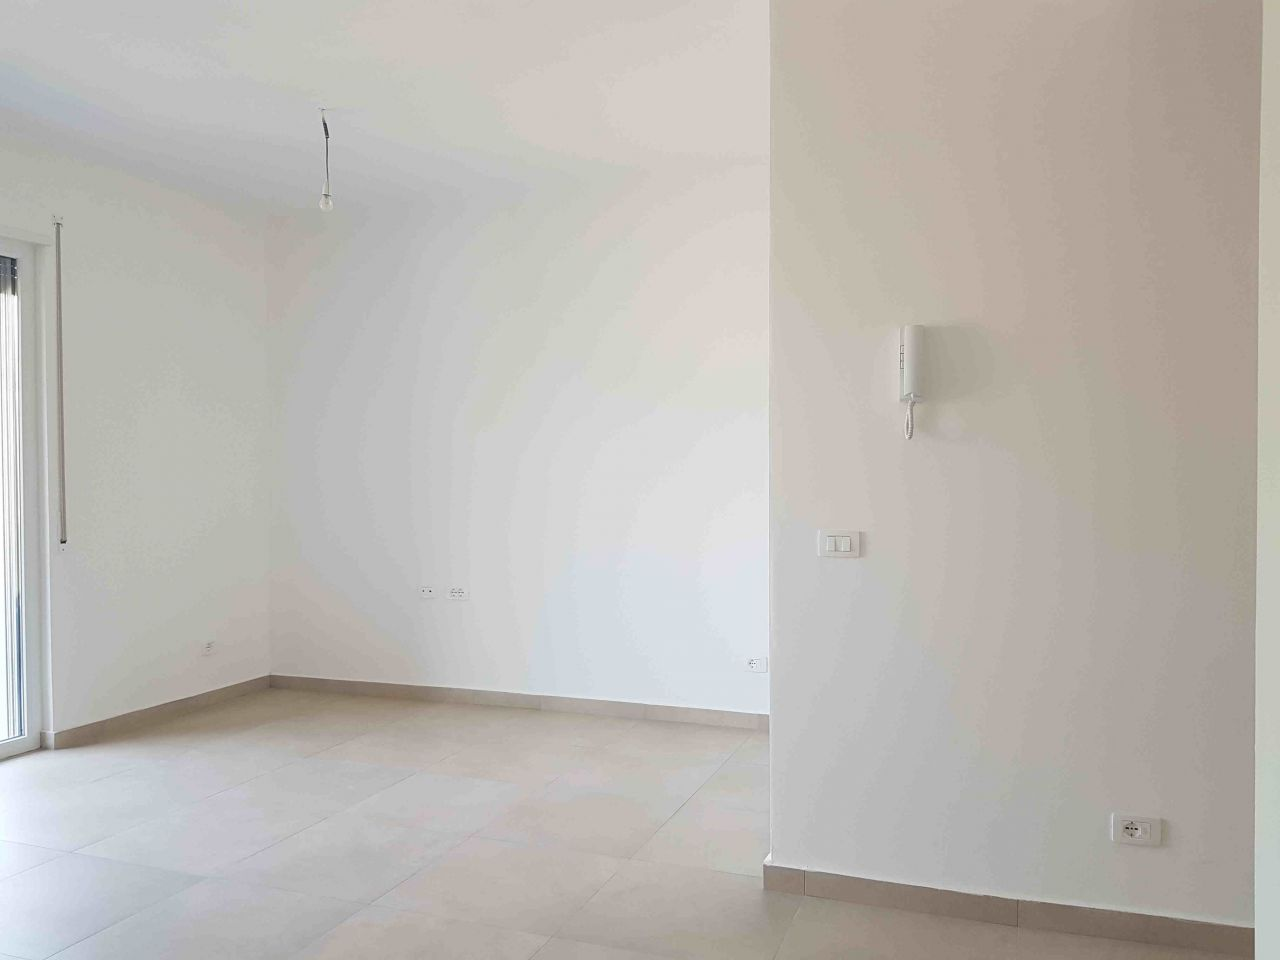 Flats For Sale At Valamar Residences Lalzit Bay